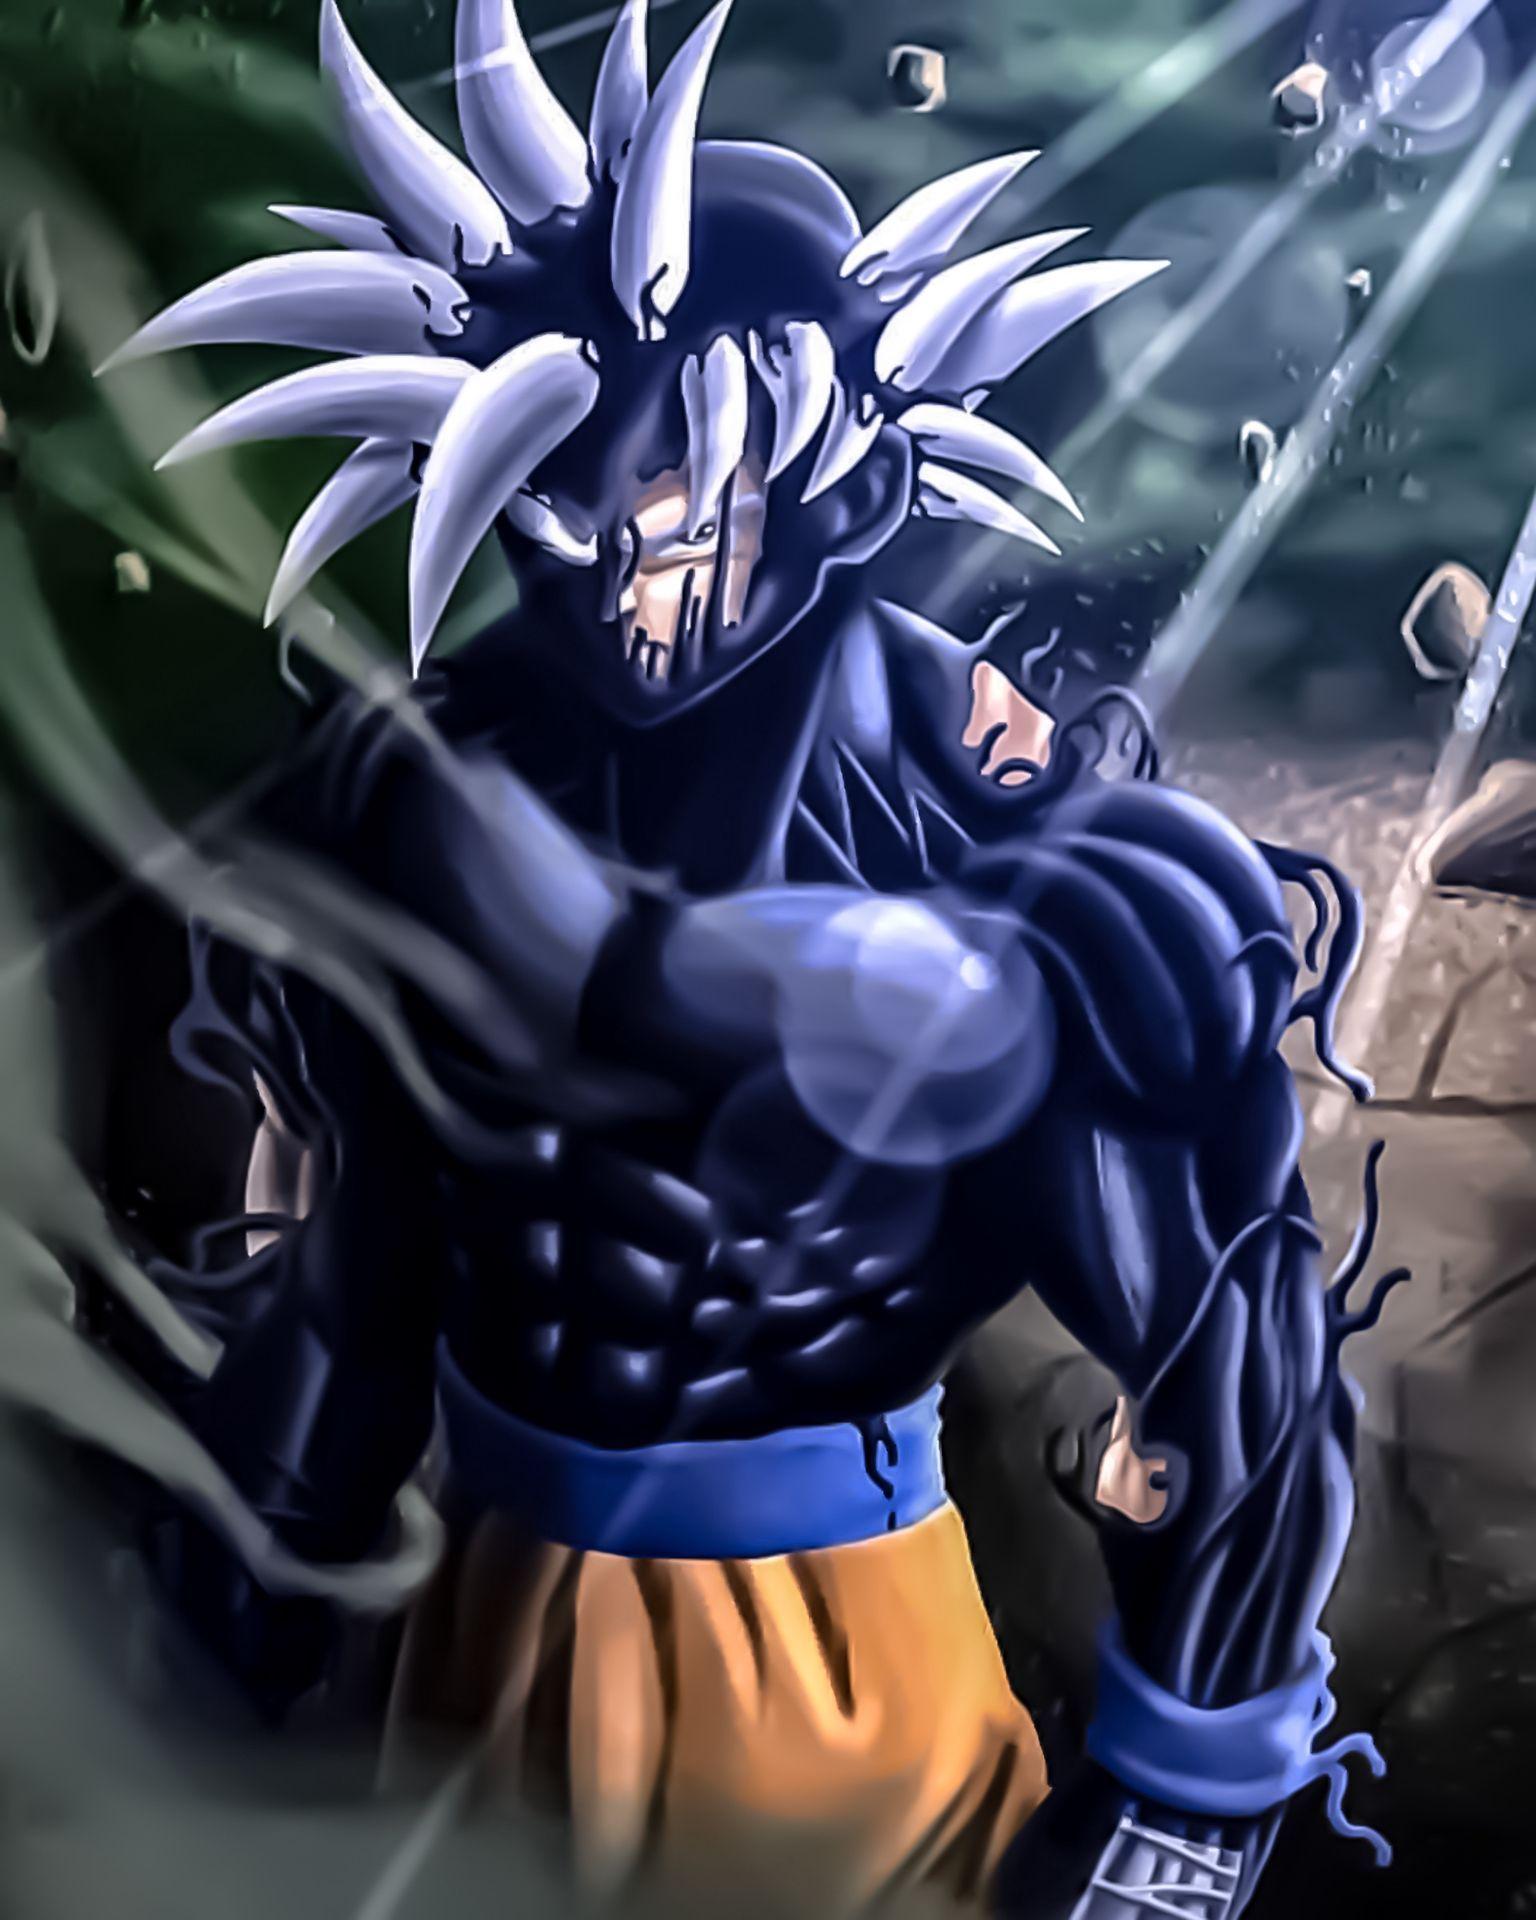 Son Goku End Of The World Dragon Ball Super Manga Dragon Ball Super Goku Dragon Ball